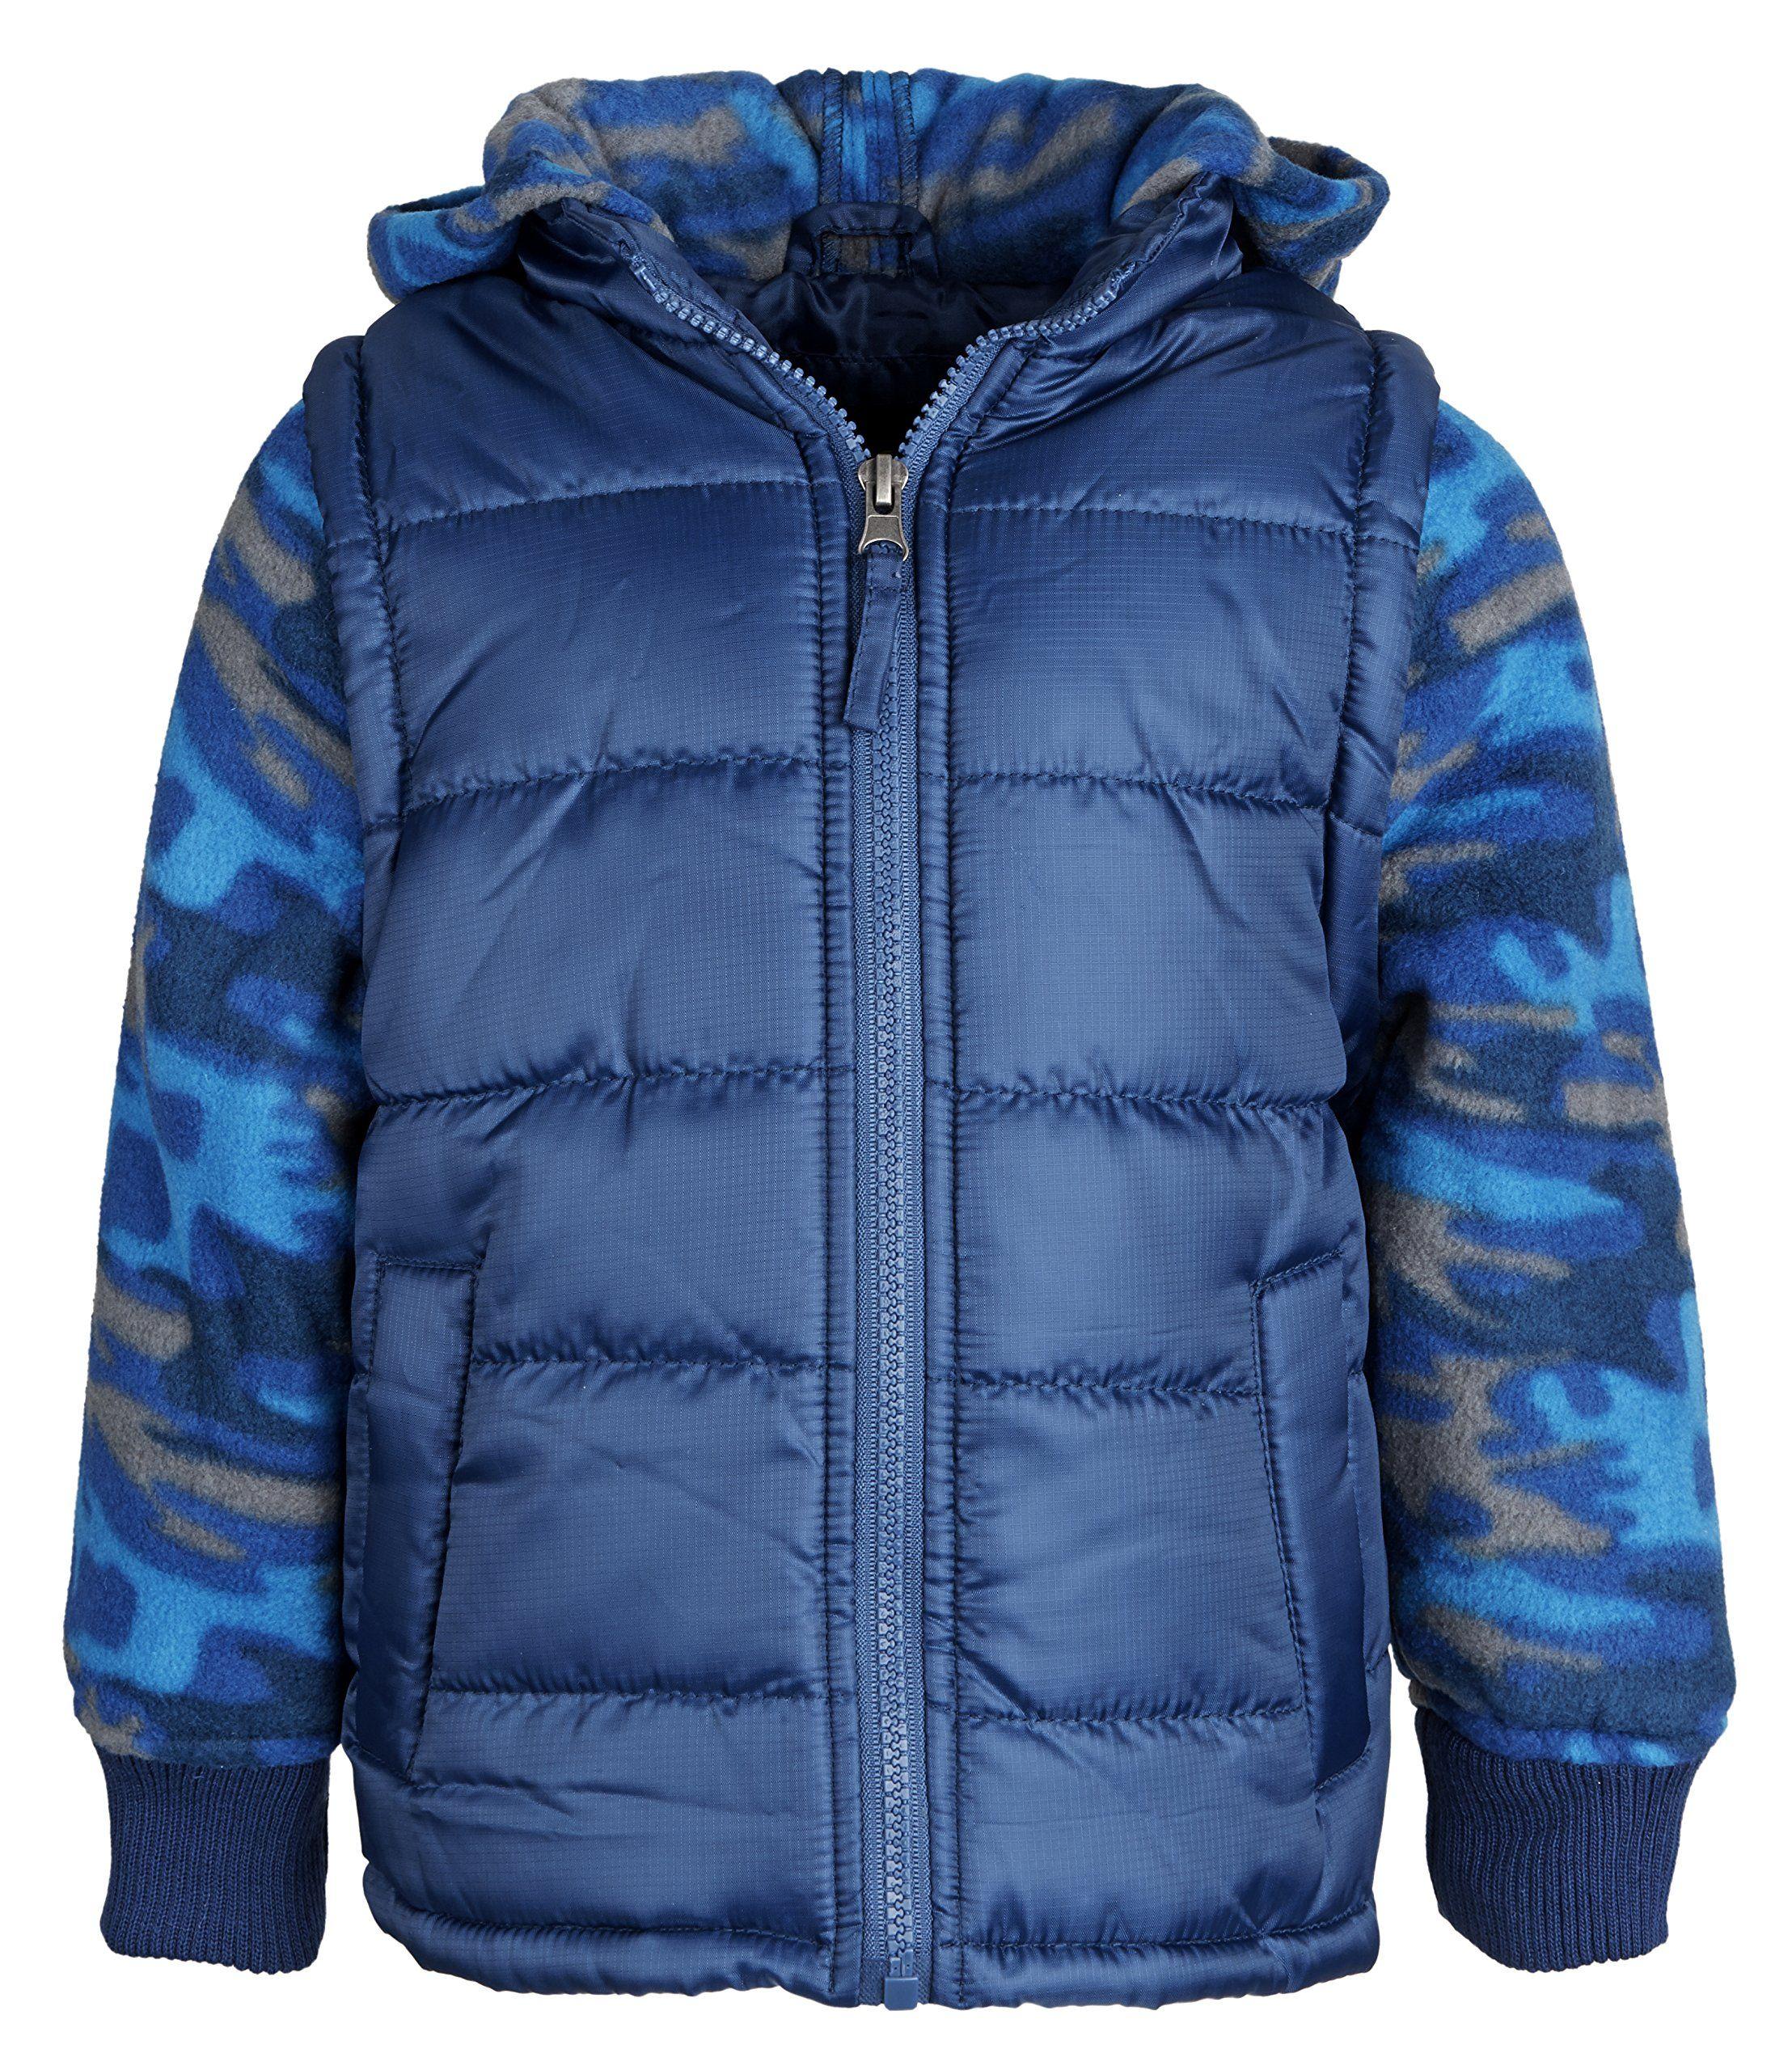 BLACK iXtreme Toddler Boys/' Camo Print Snowsuit